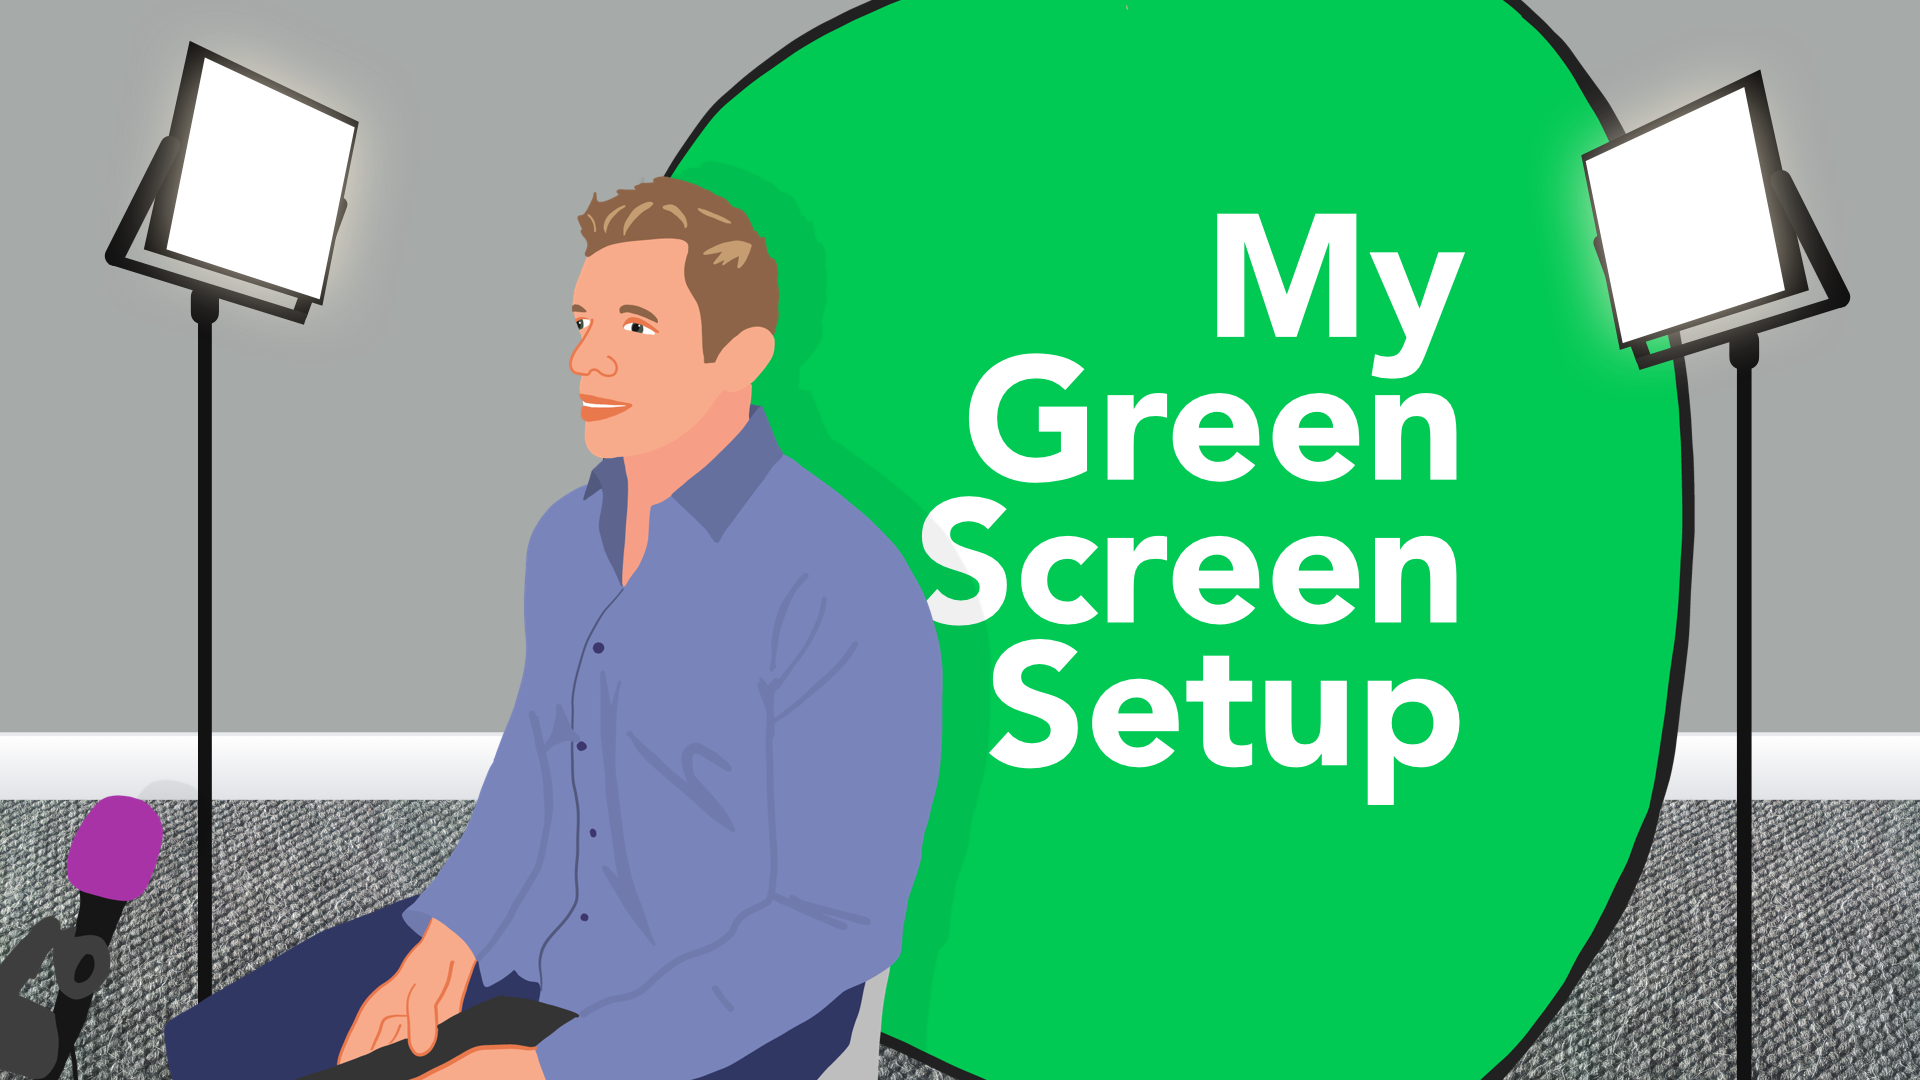 My Green Screen Setup